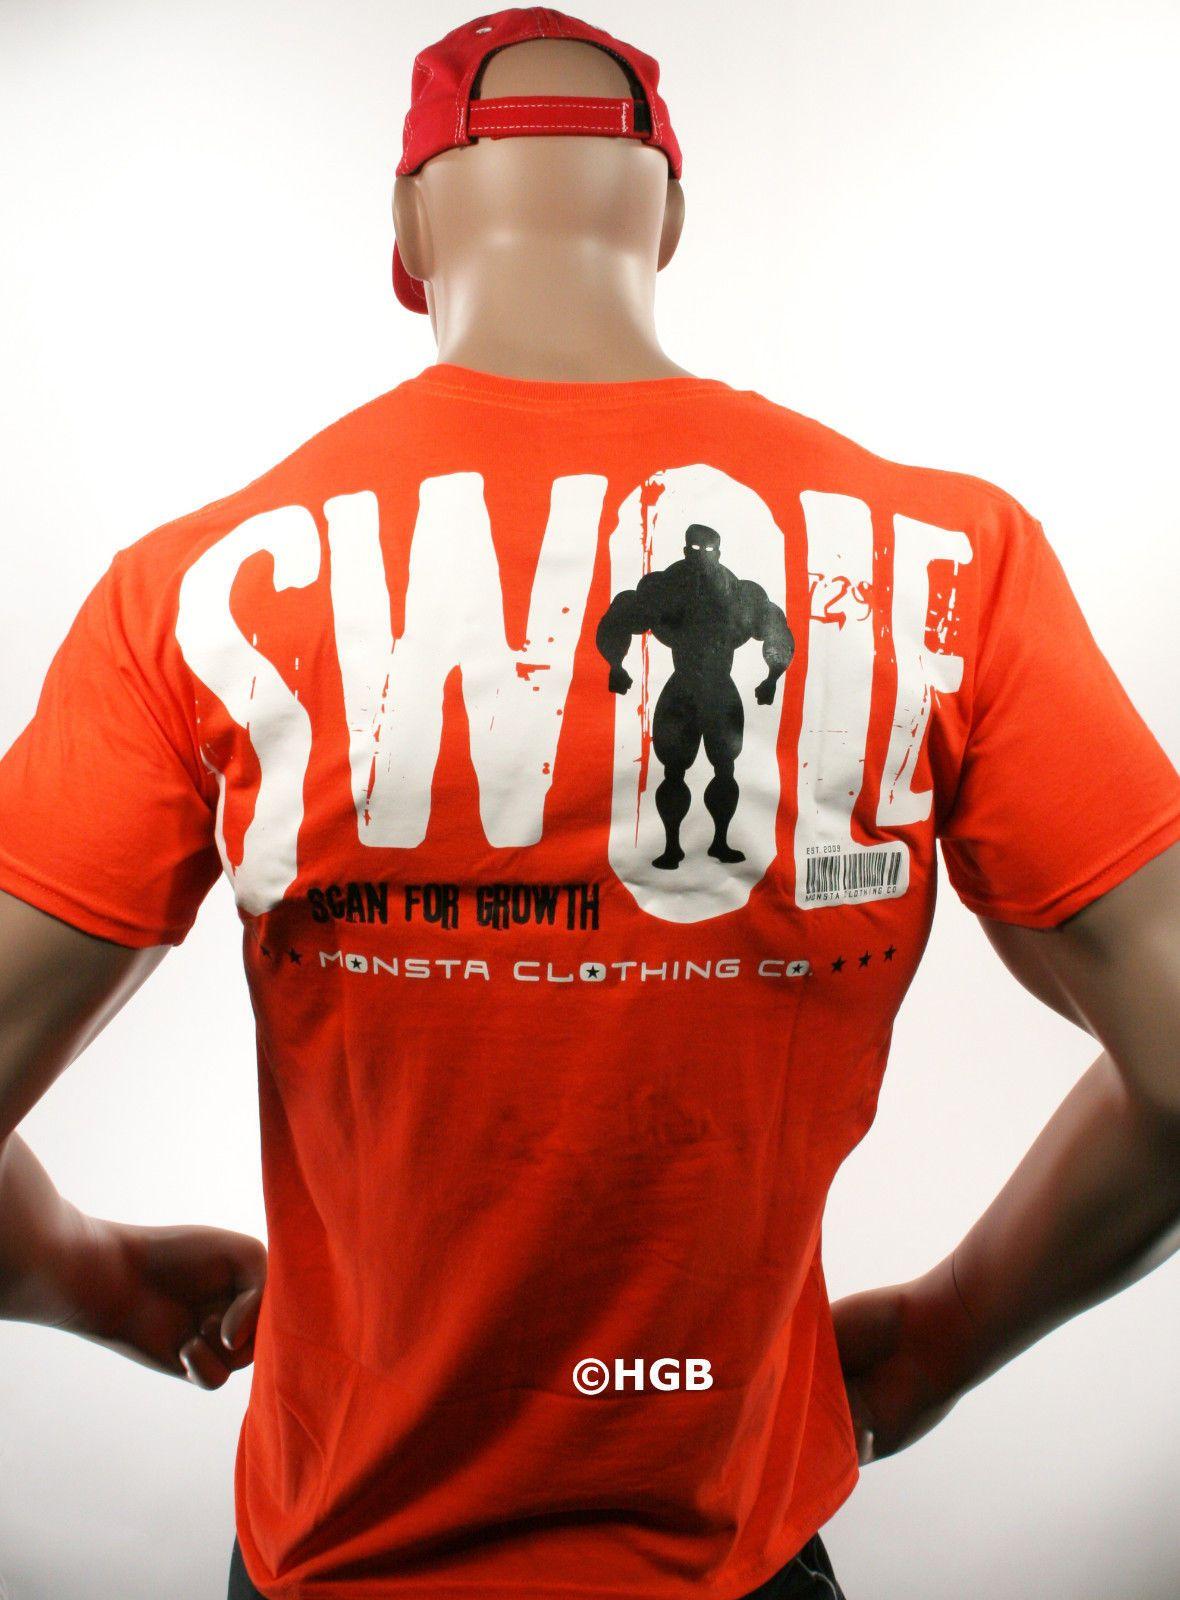 Monsta Clothing Mens Graphic Tee Bodybuilding Wear SWOLE T Shirt Gym wear New